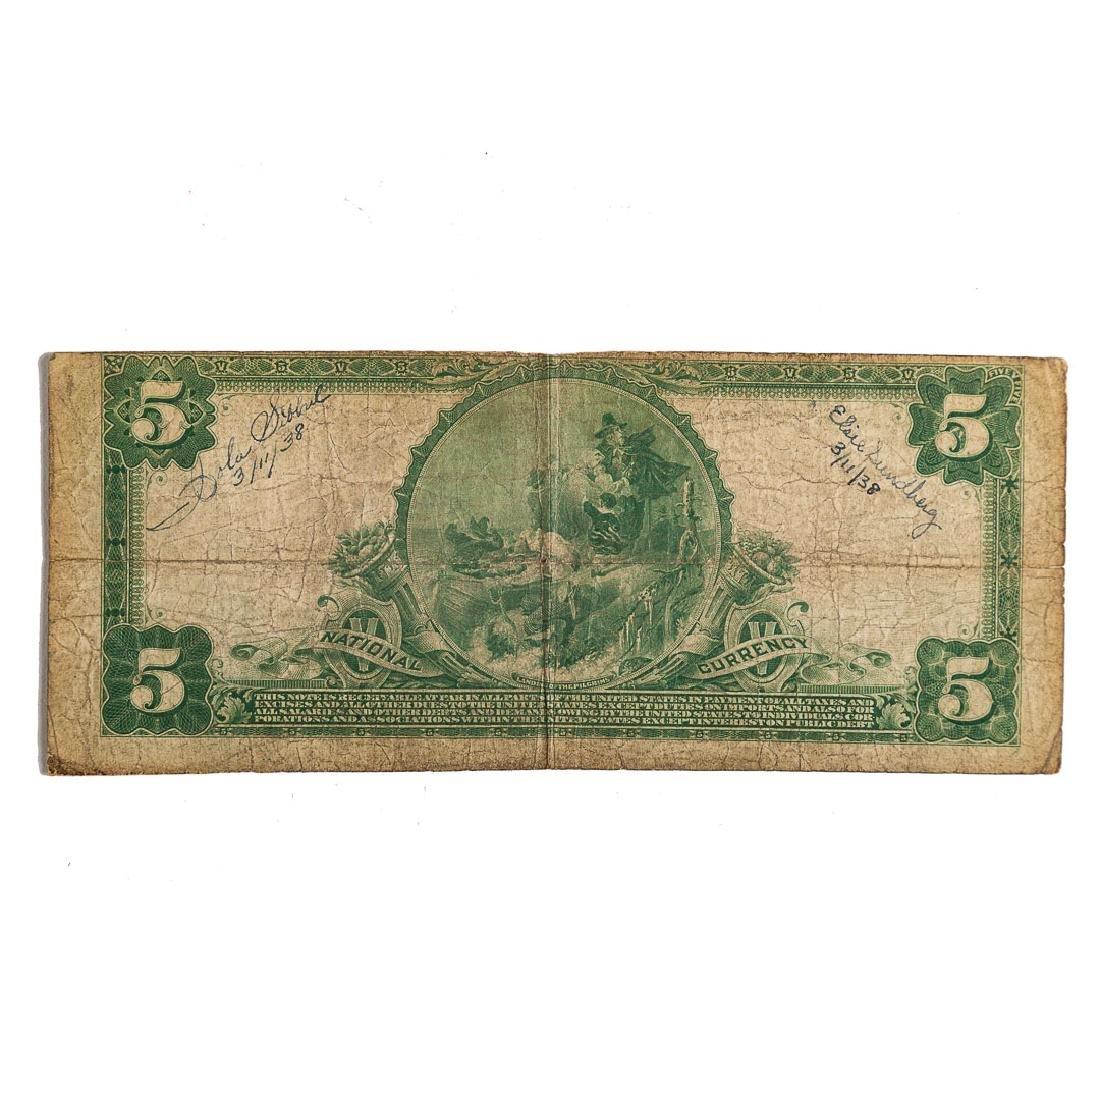 [US] $5 1902 Plain Bank CH# 5312 Fr-607 - 2